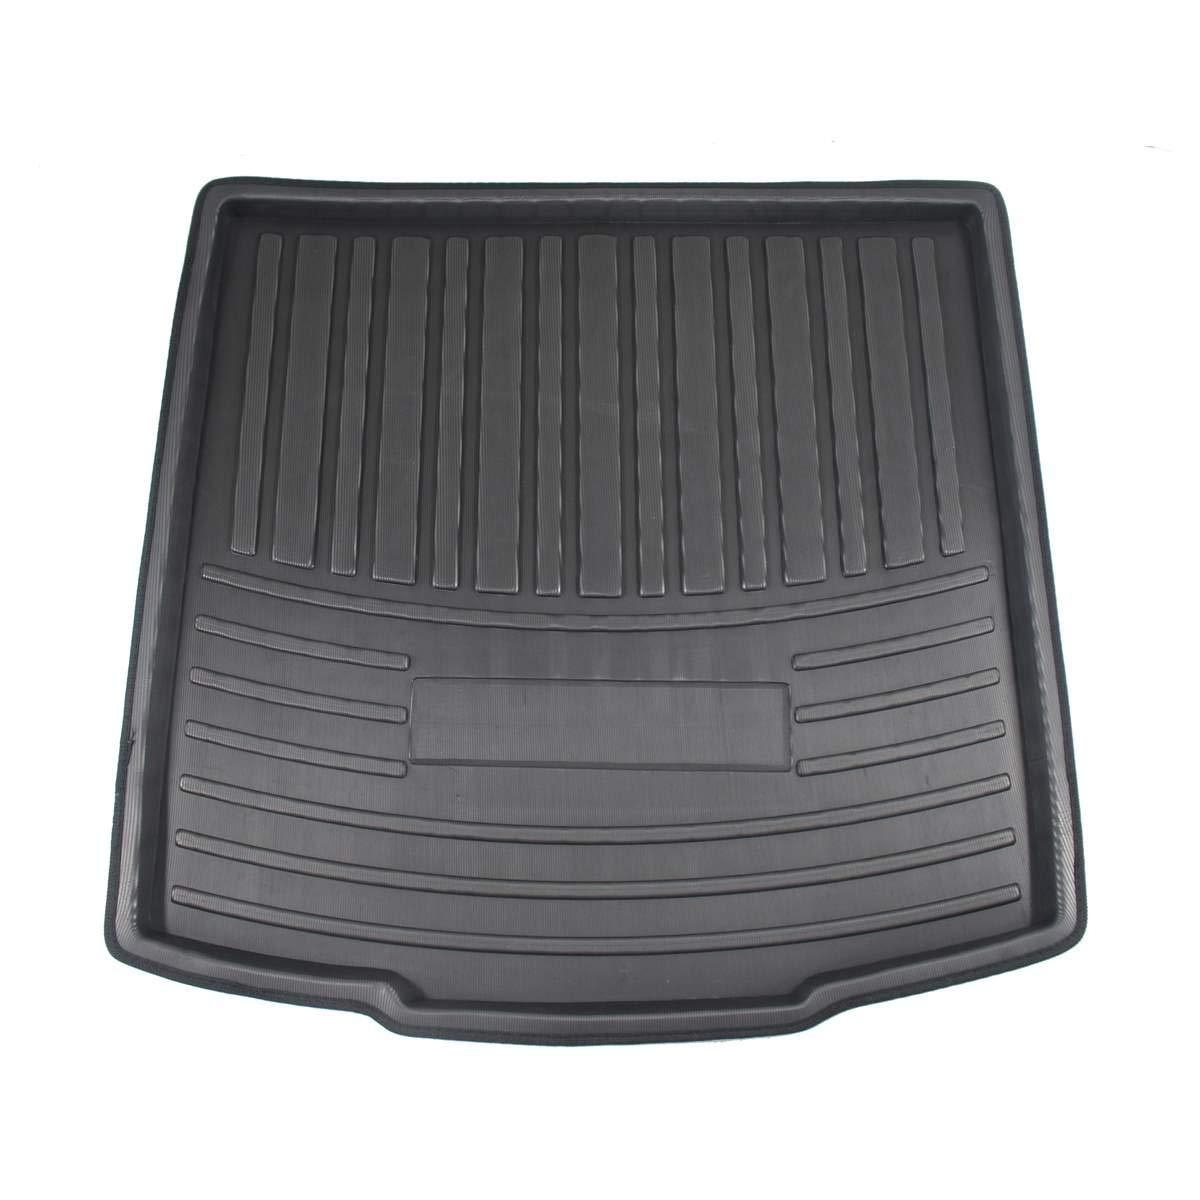 Car Cargo Liner Boot Tray Cubierta del Maletero Trasero Matt Mat Floor Carpet Kick Pad para Skoda Kodiaq 5//7 Seat Seater 2017 2018 2019